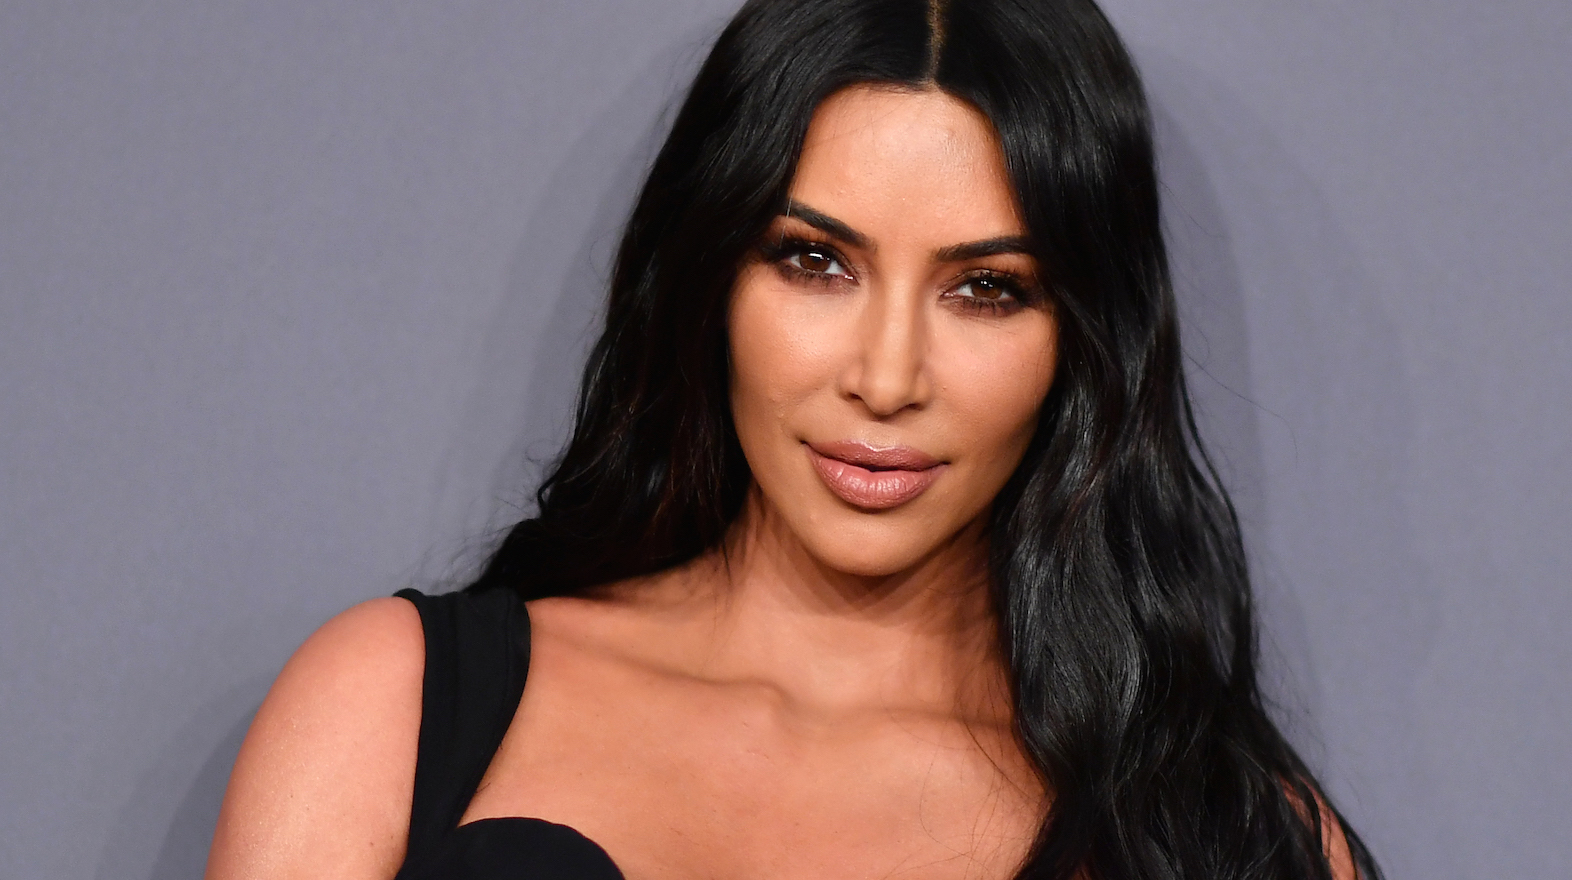 9e502ed9635 She Woke Up Like This! Kim Kardashian Posts New  Morning Psoriasis  Selfie